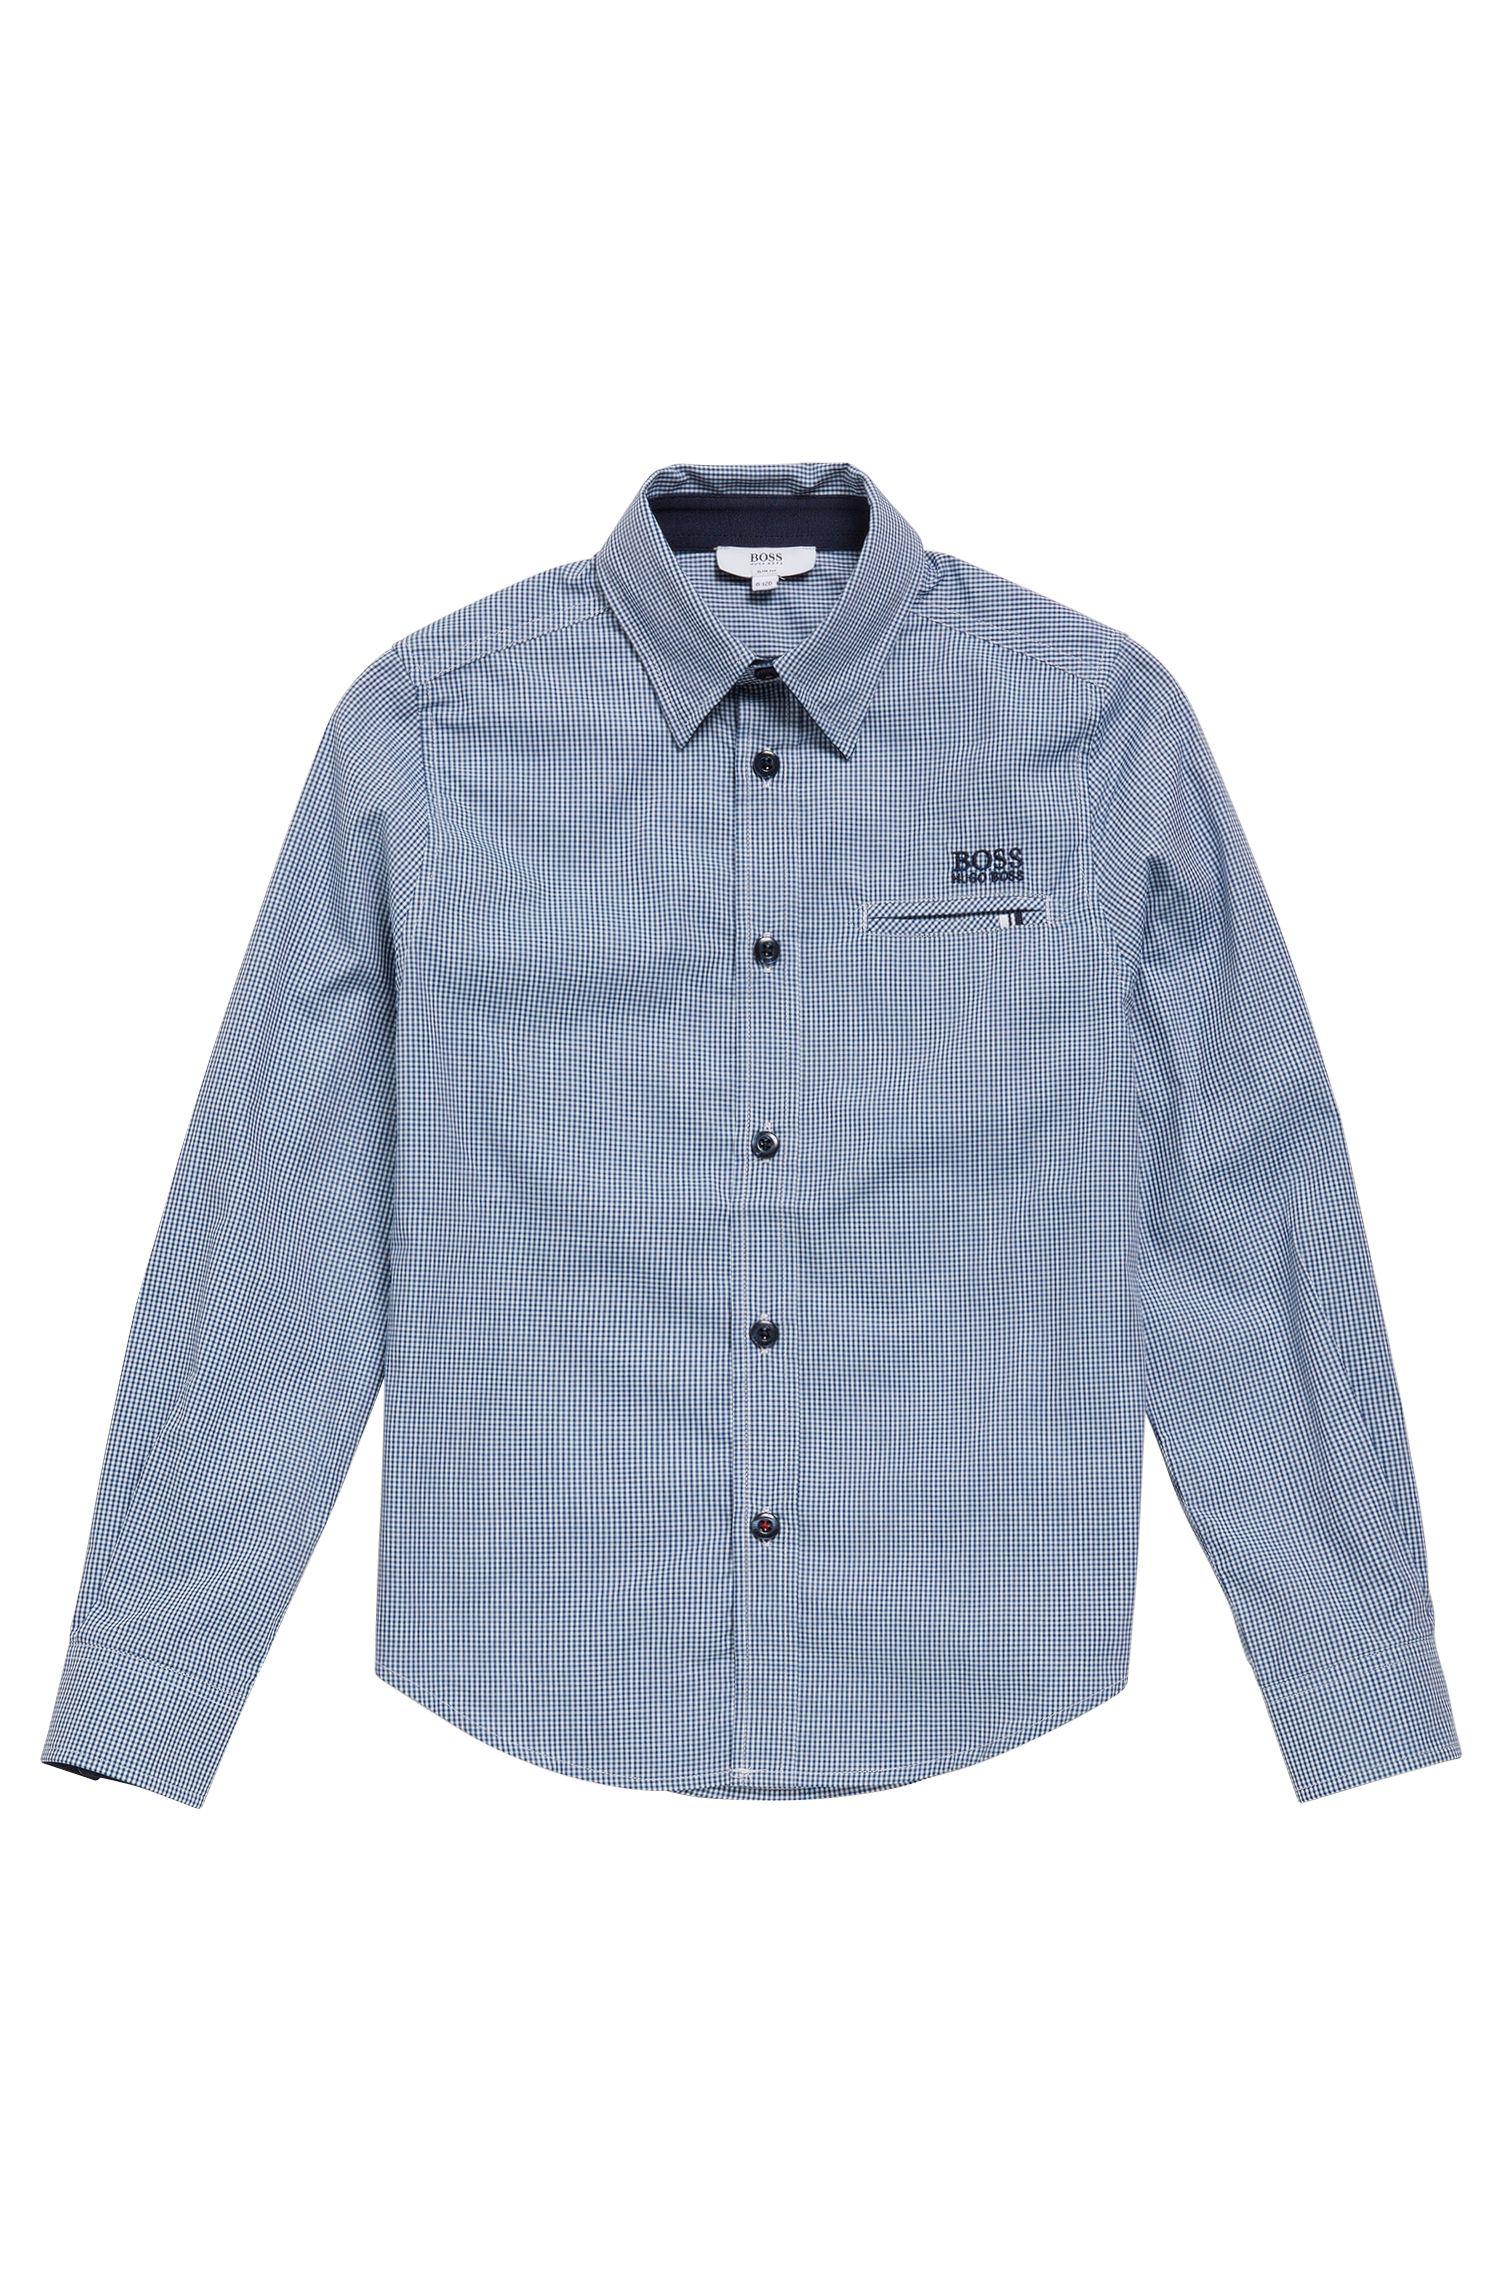 Kids' cotton shirt in a check design: 'J25A20'